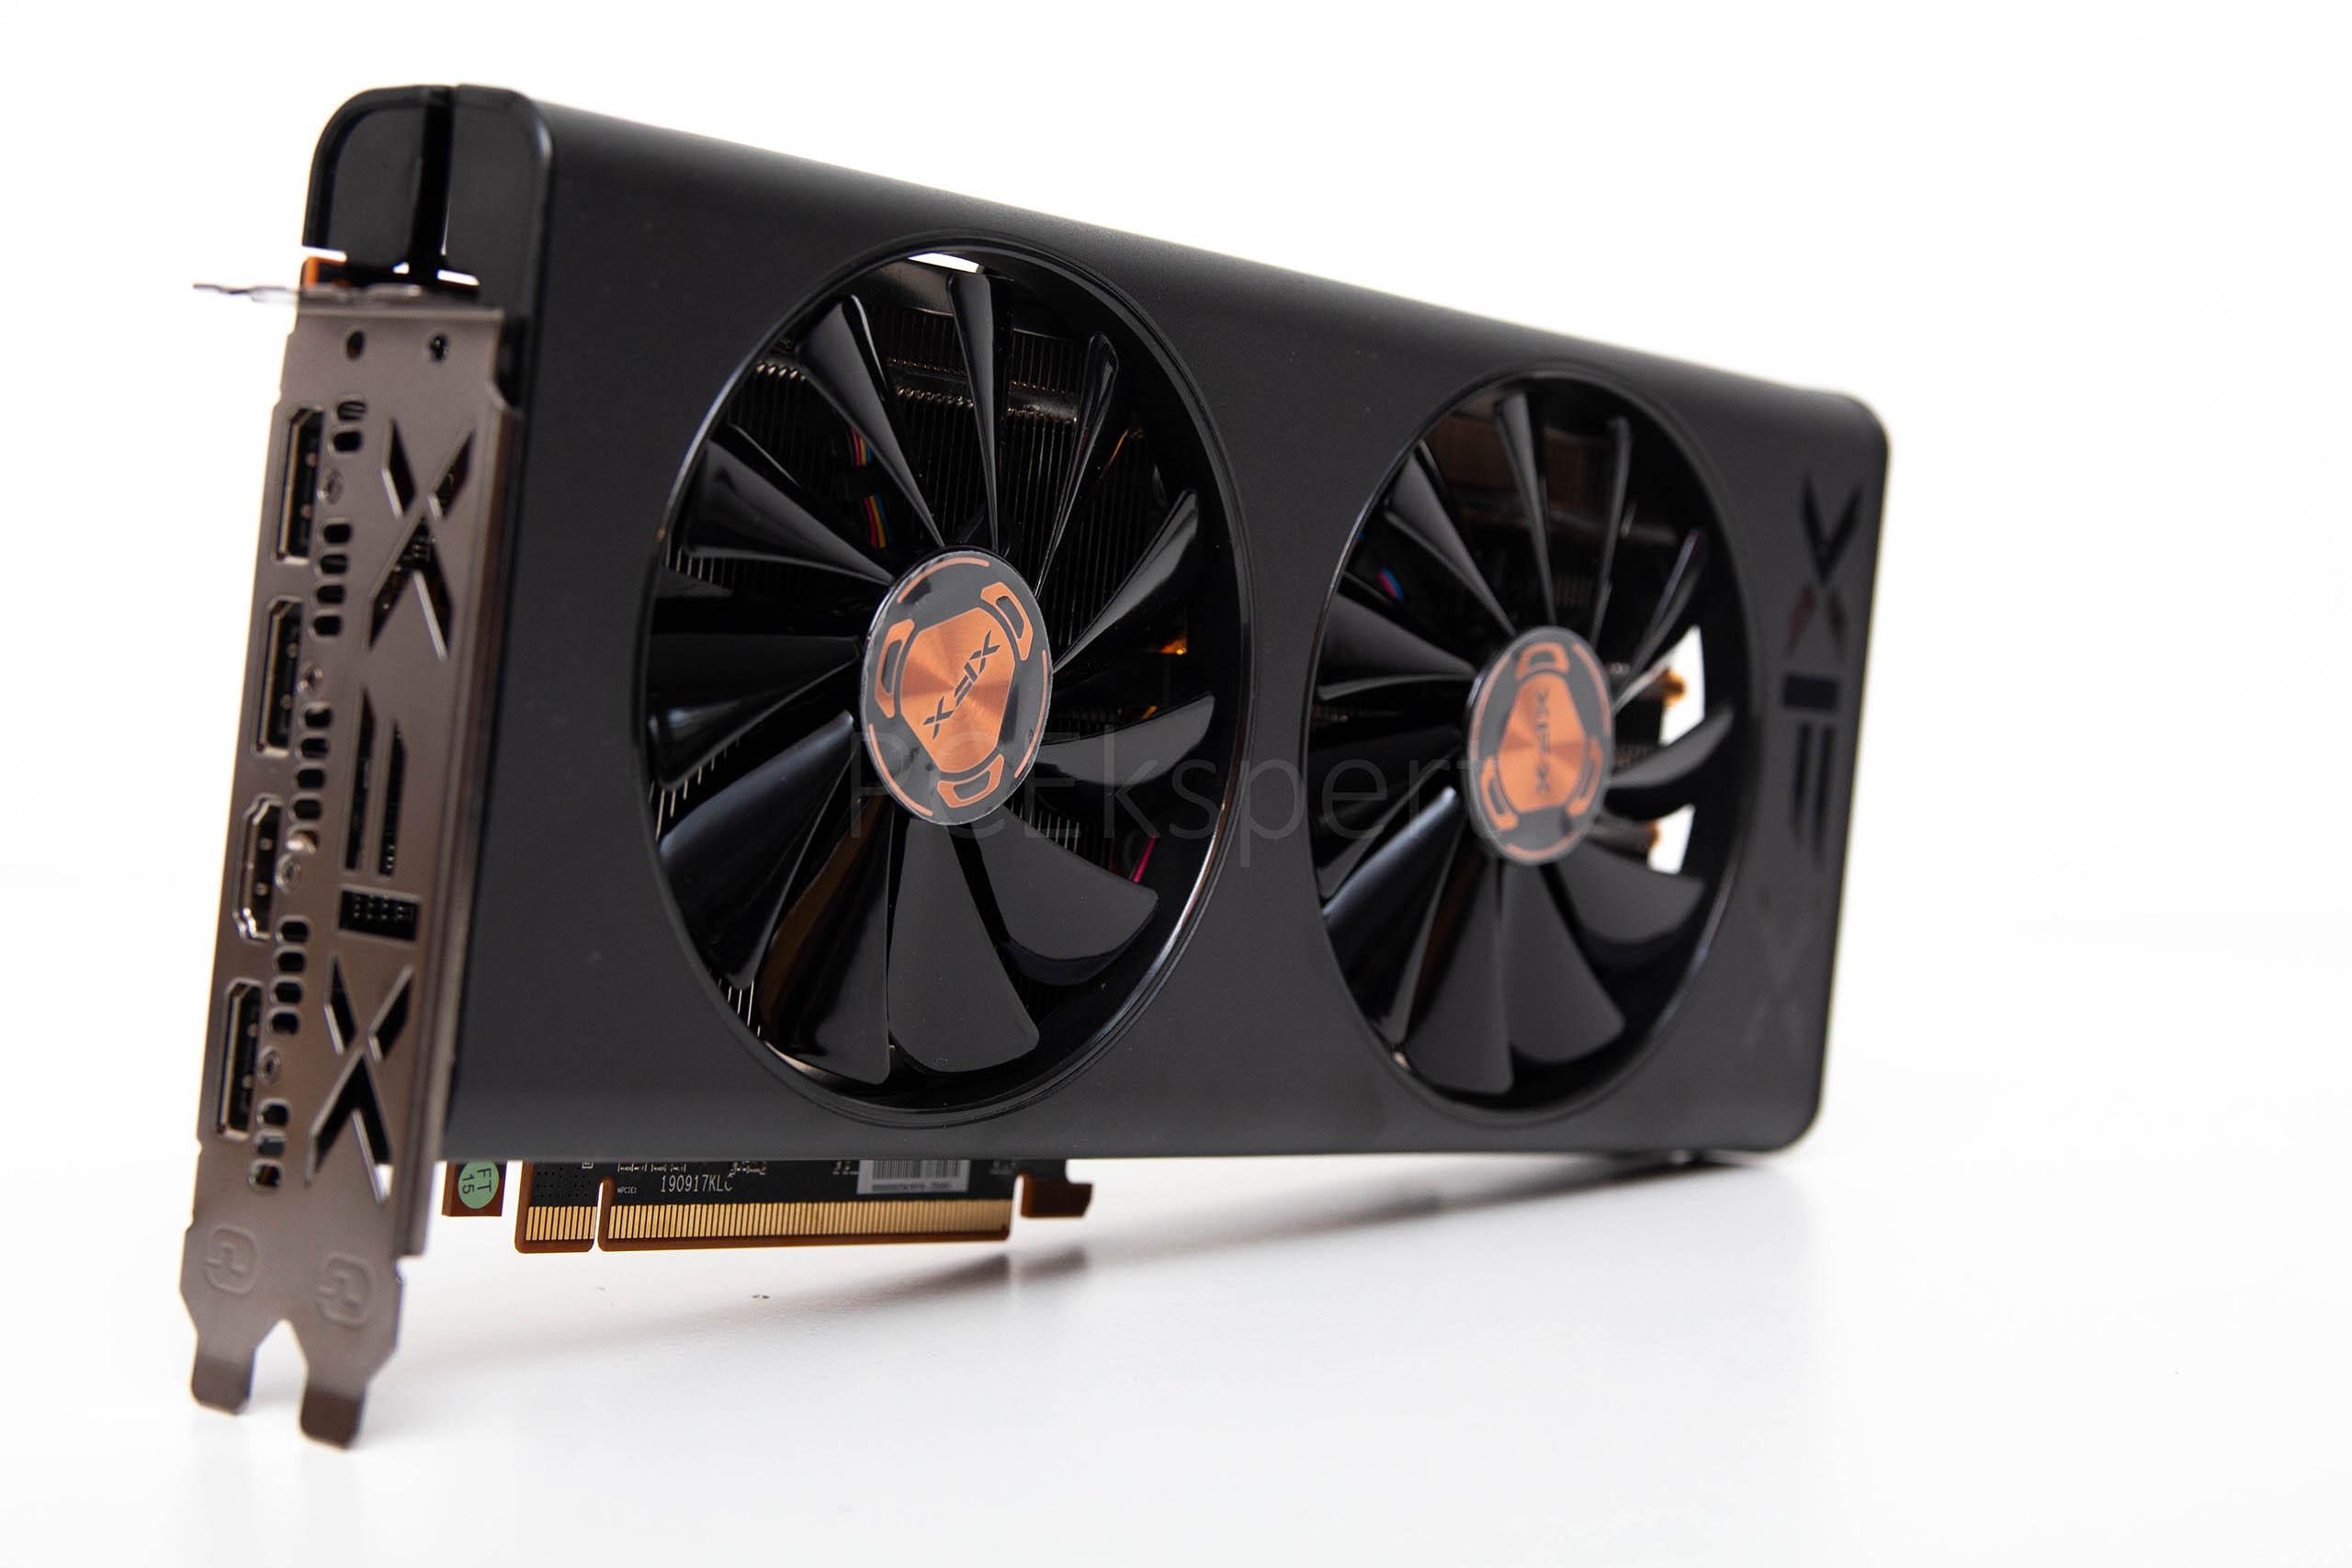 XFX Radeon RX 5600 XT THICC II PRO 14 Gbps recenzija